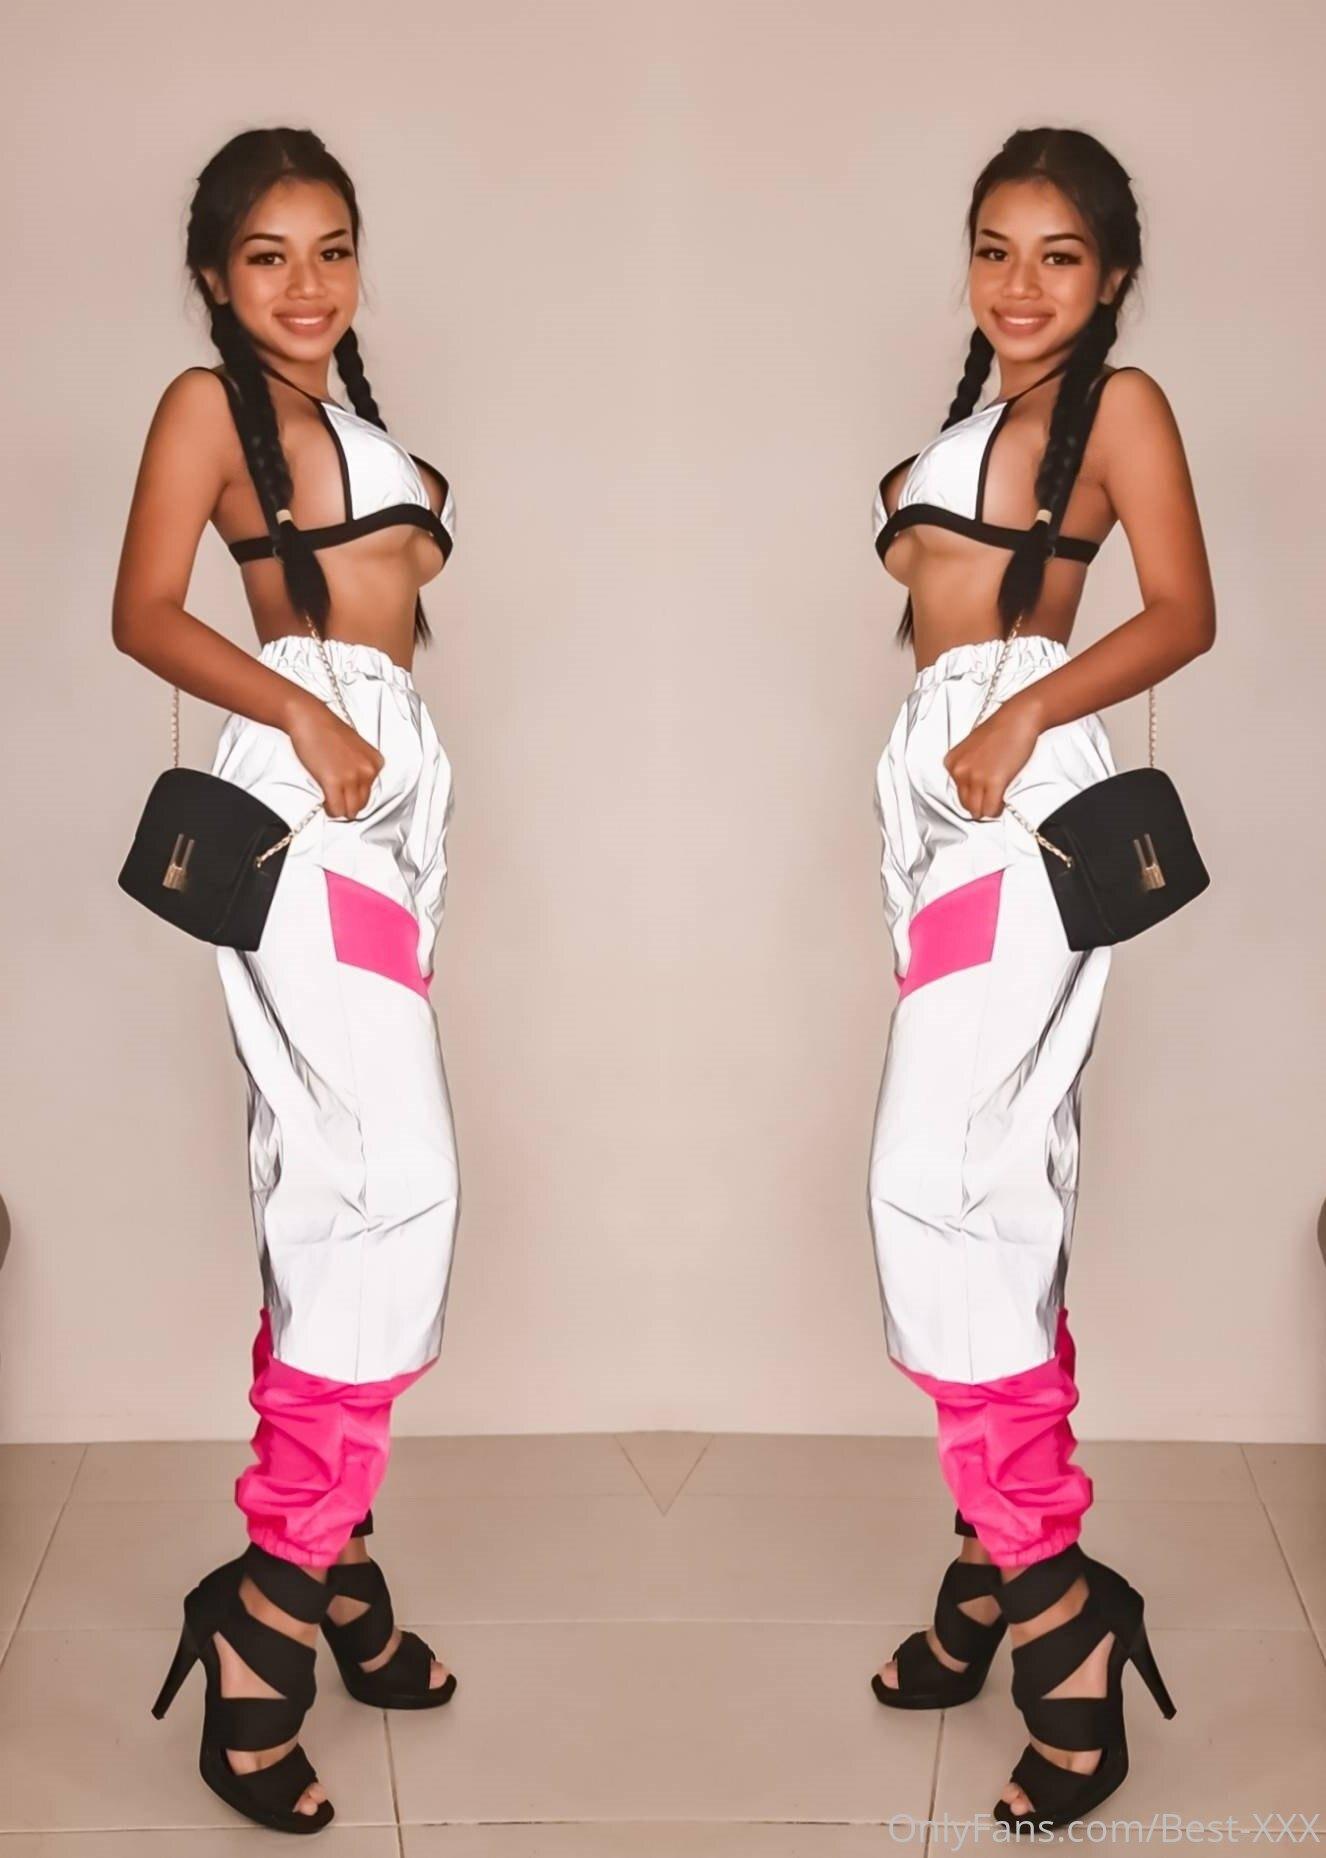 Mo Thai Pattaya Girl Leaked Onlyfans Best Xxx 0047